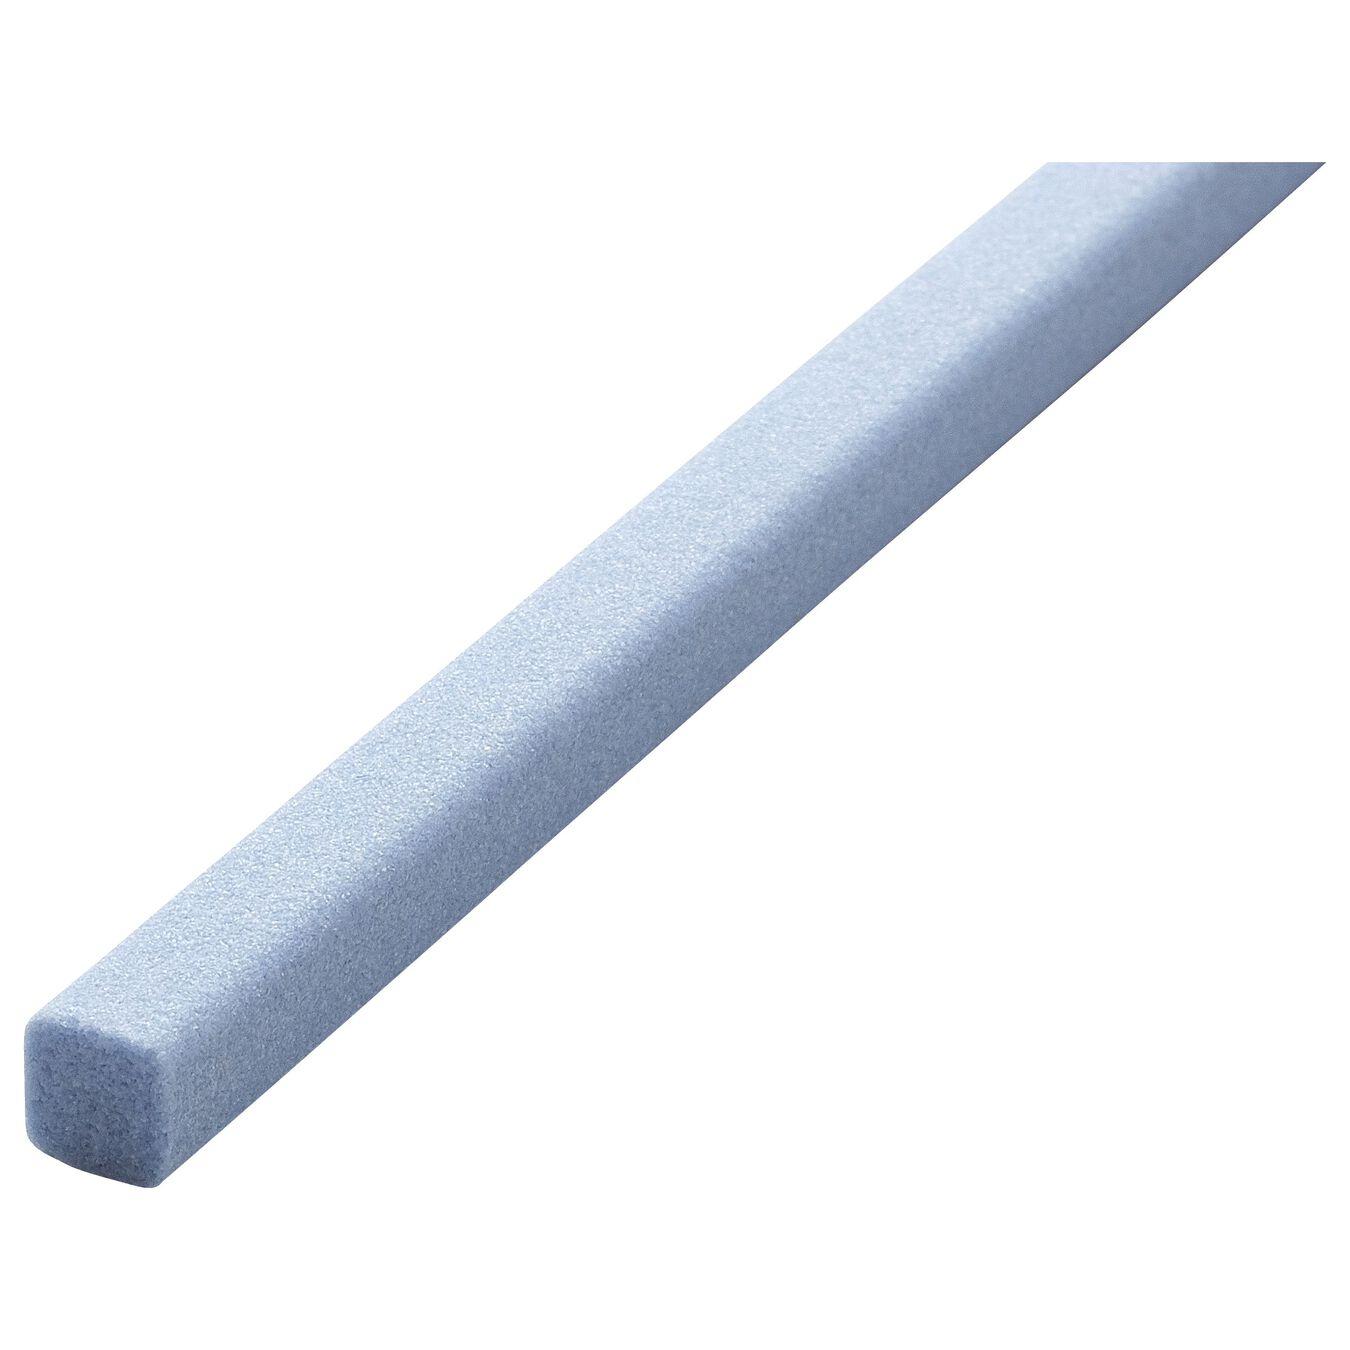 Affilacoltelli - 8 cm, ABS, nero,,large 7